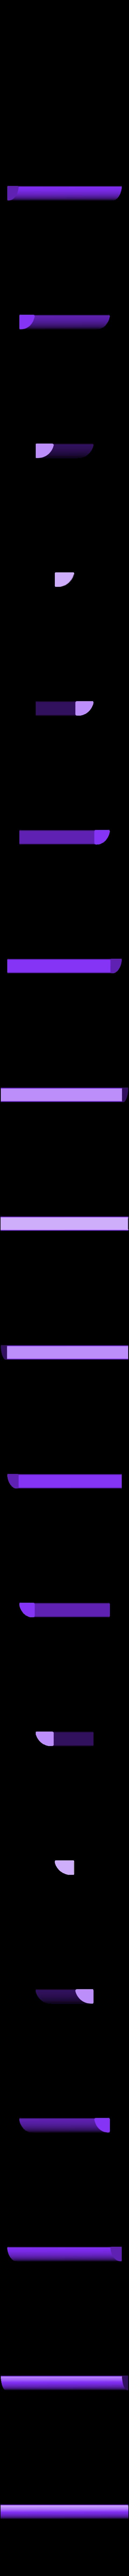 side_tank.STL Download free STL file 4-8-8-4 Big Boy Locomotive • 3D printer object, RaymondDeLuca